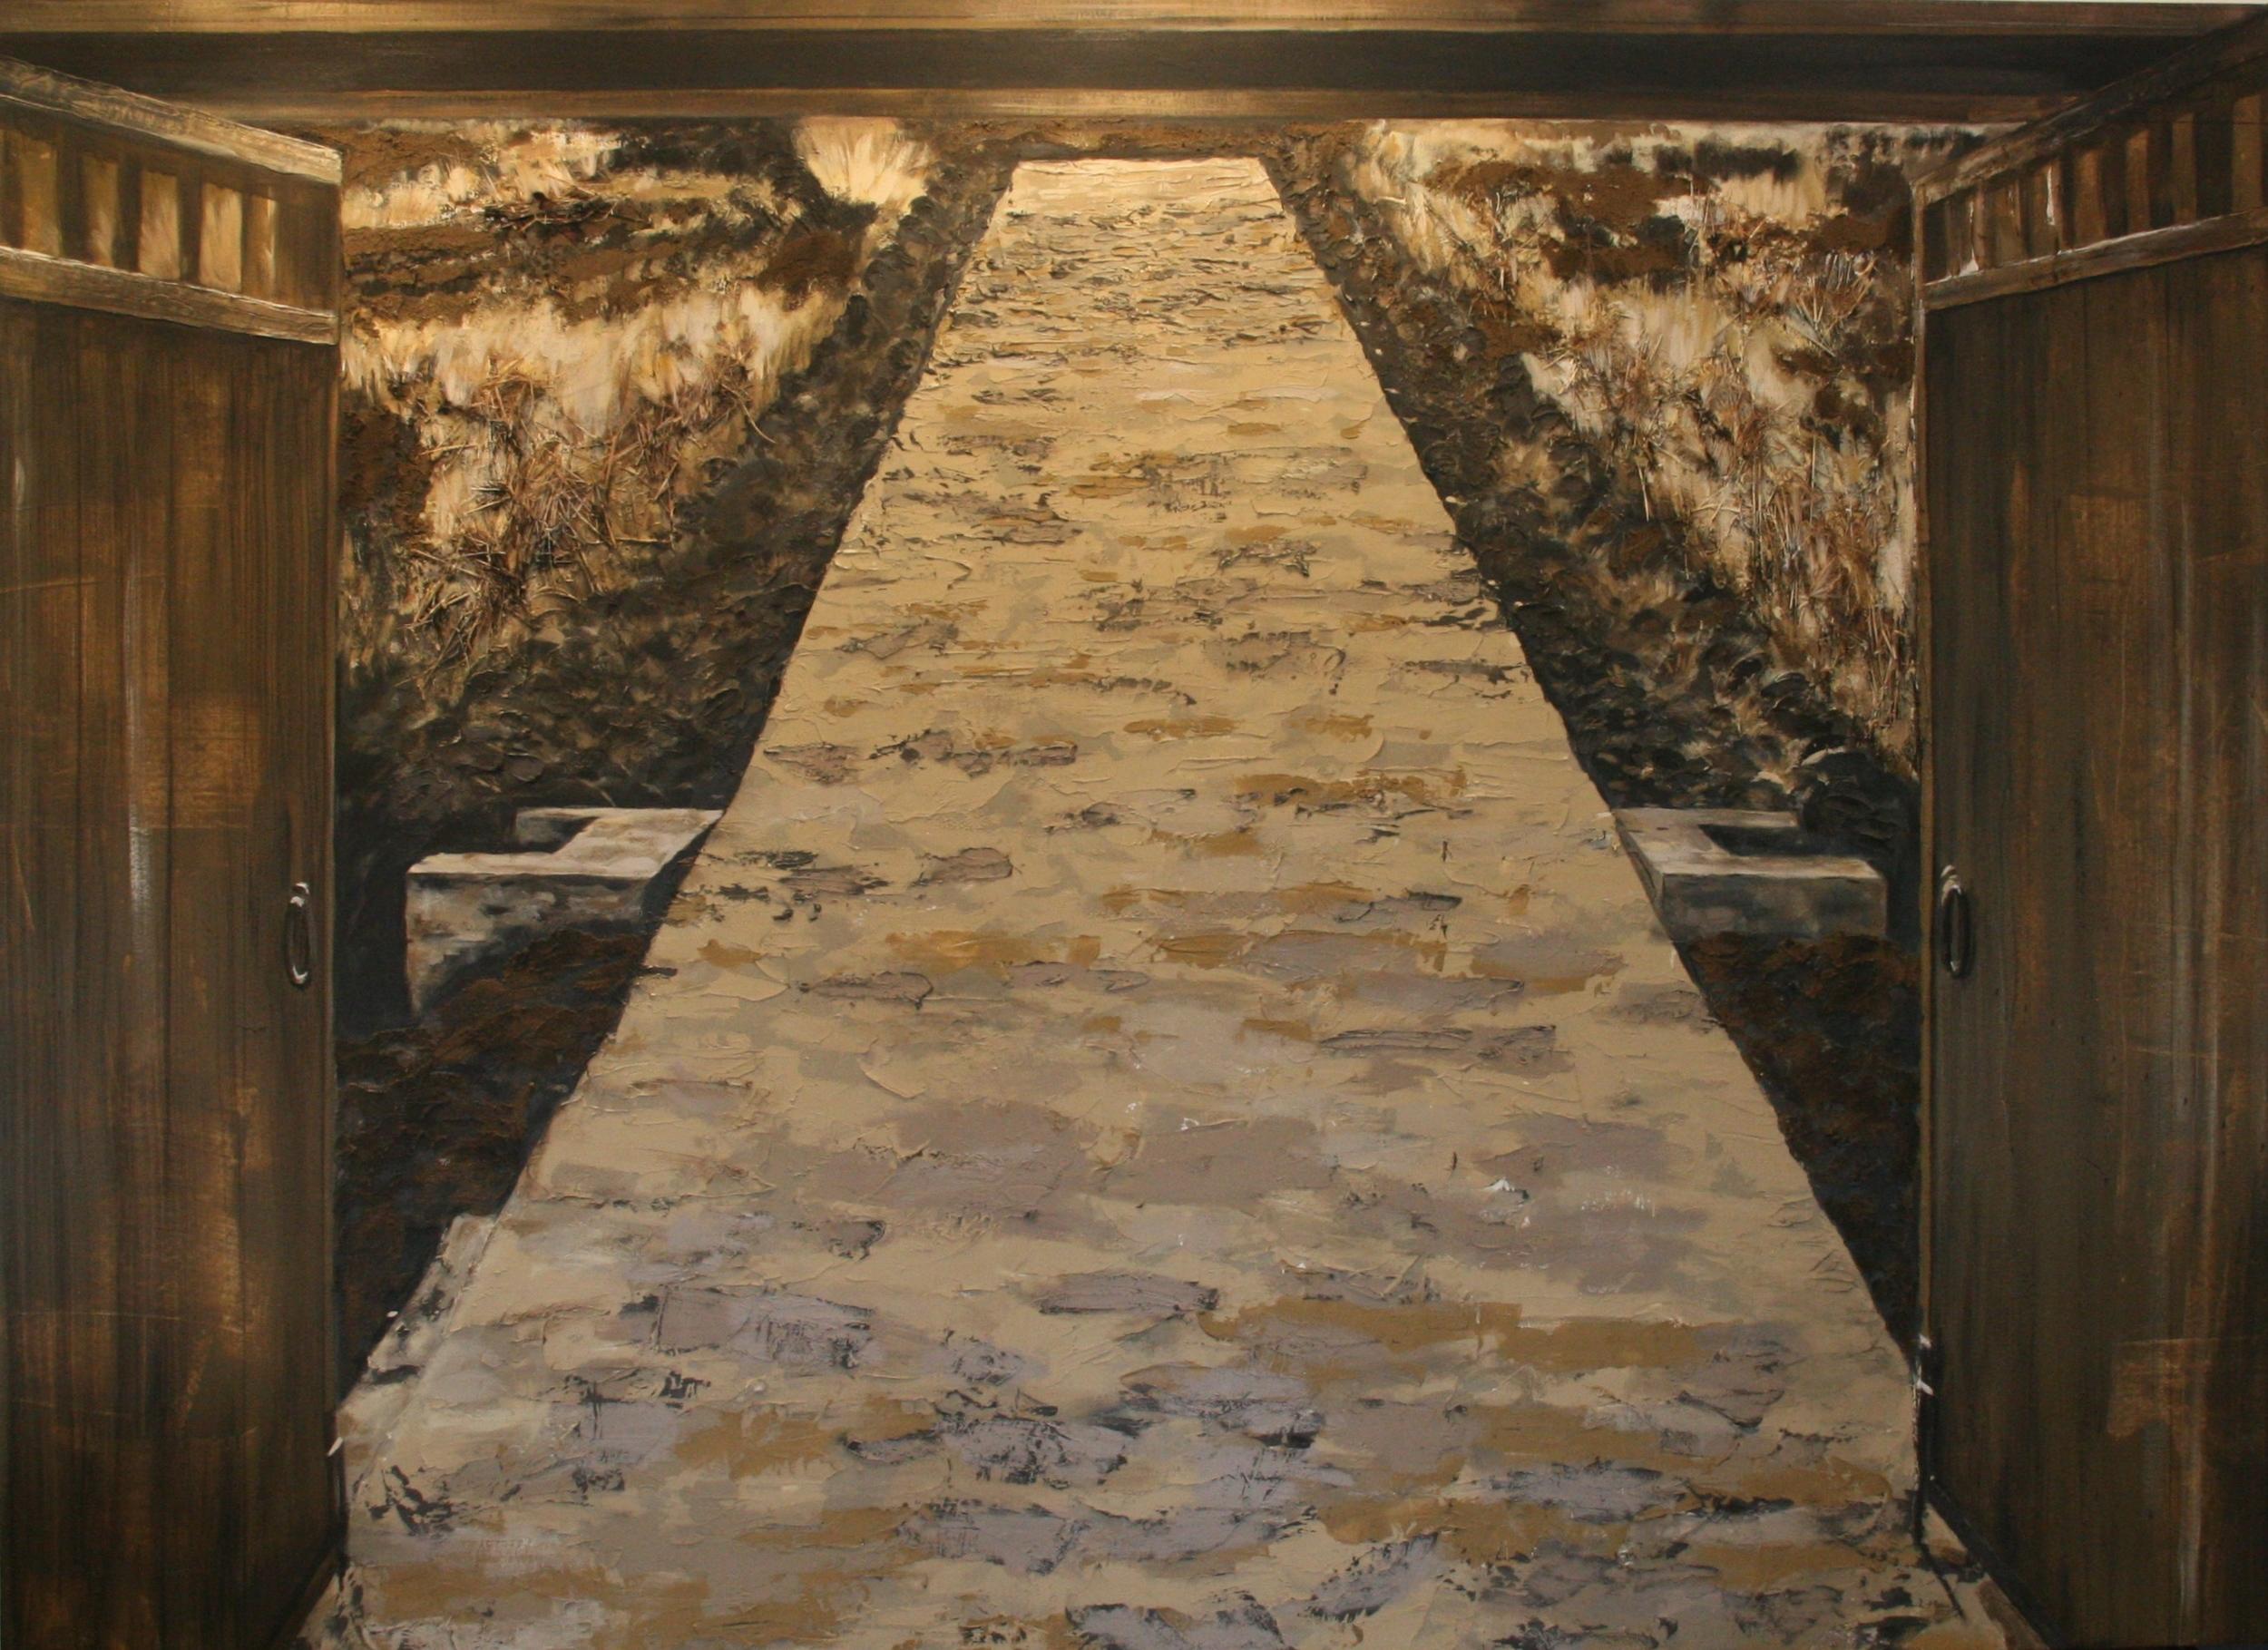 The Road - mixed media on canvas - Leslie Lemberg.jpg